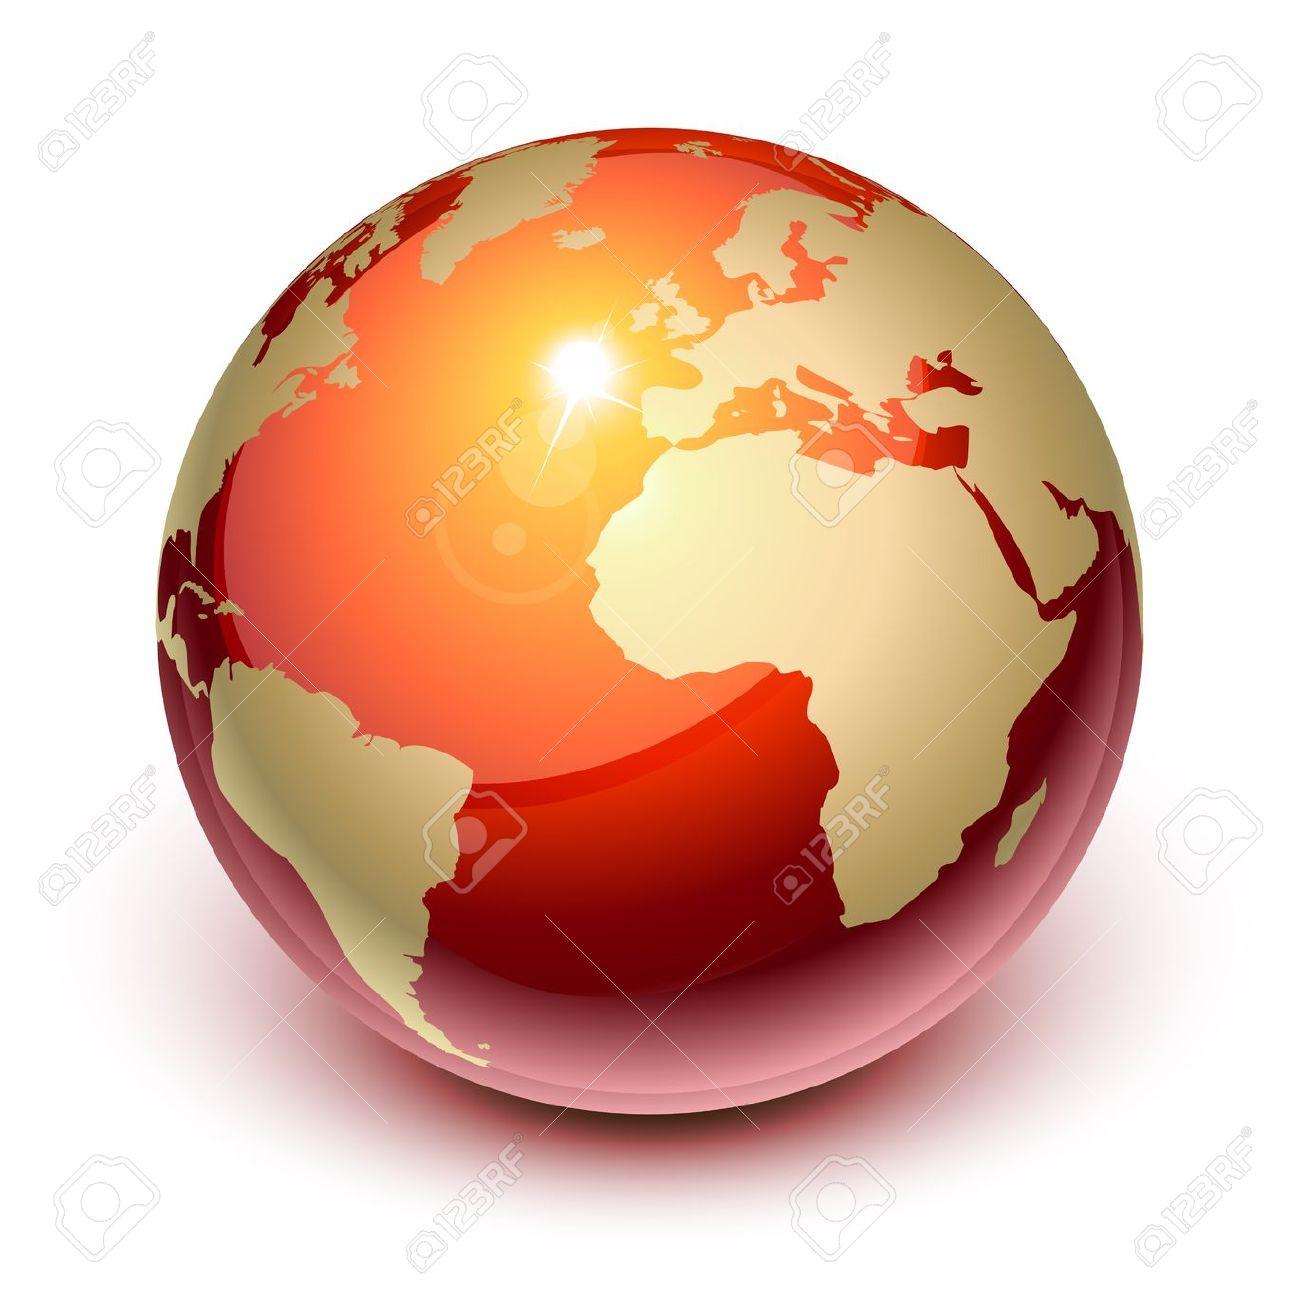 Terra Rossa Da Europa E Africa Clipart Royalty.